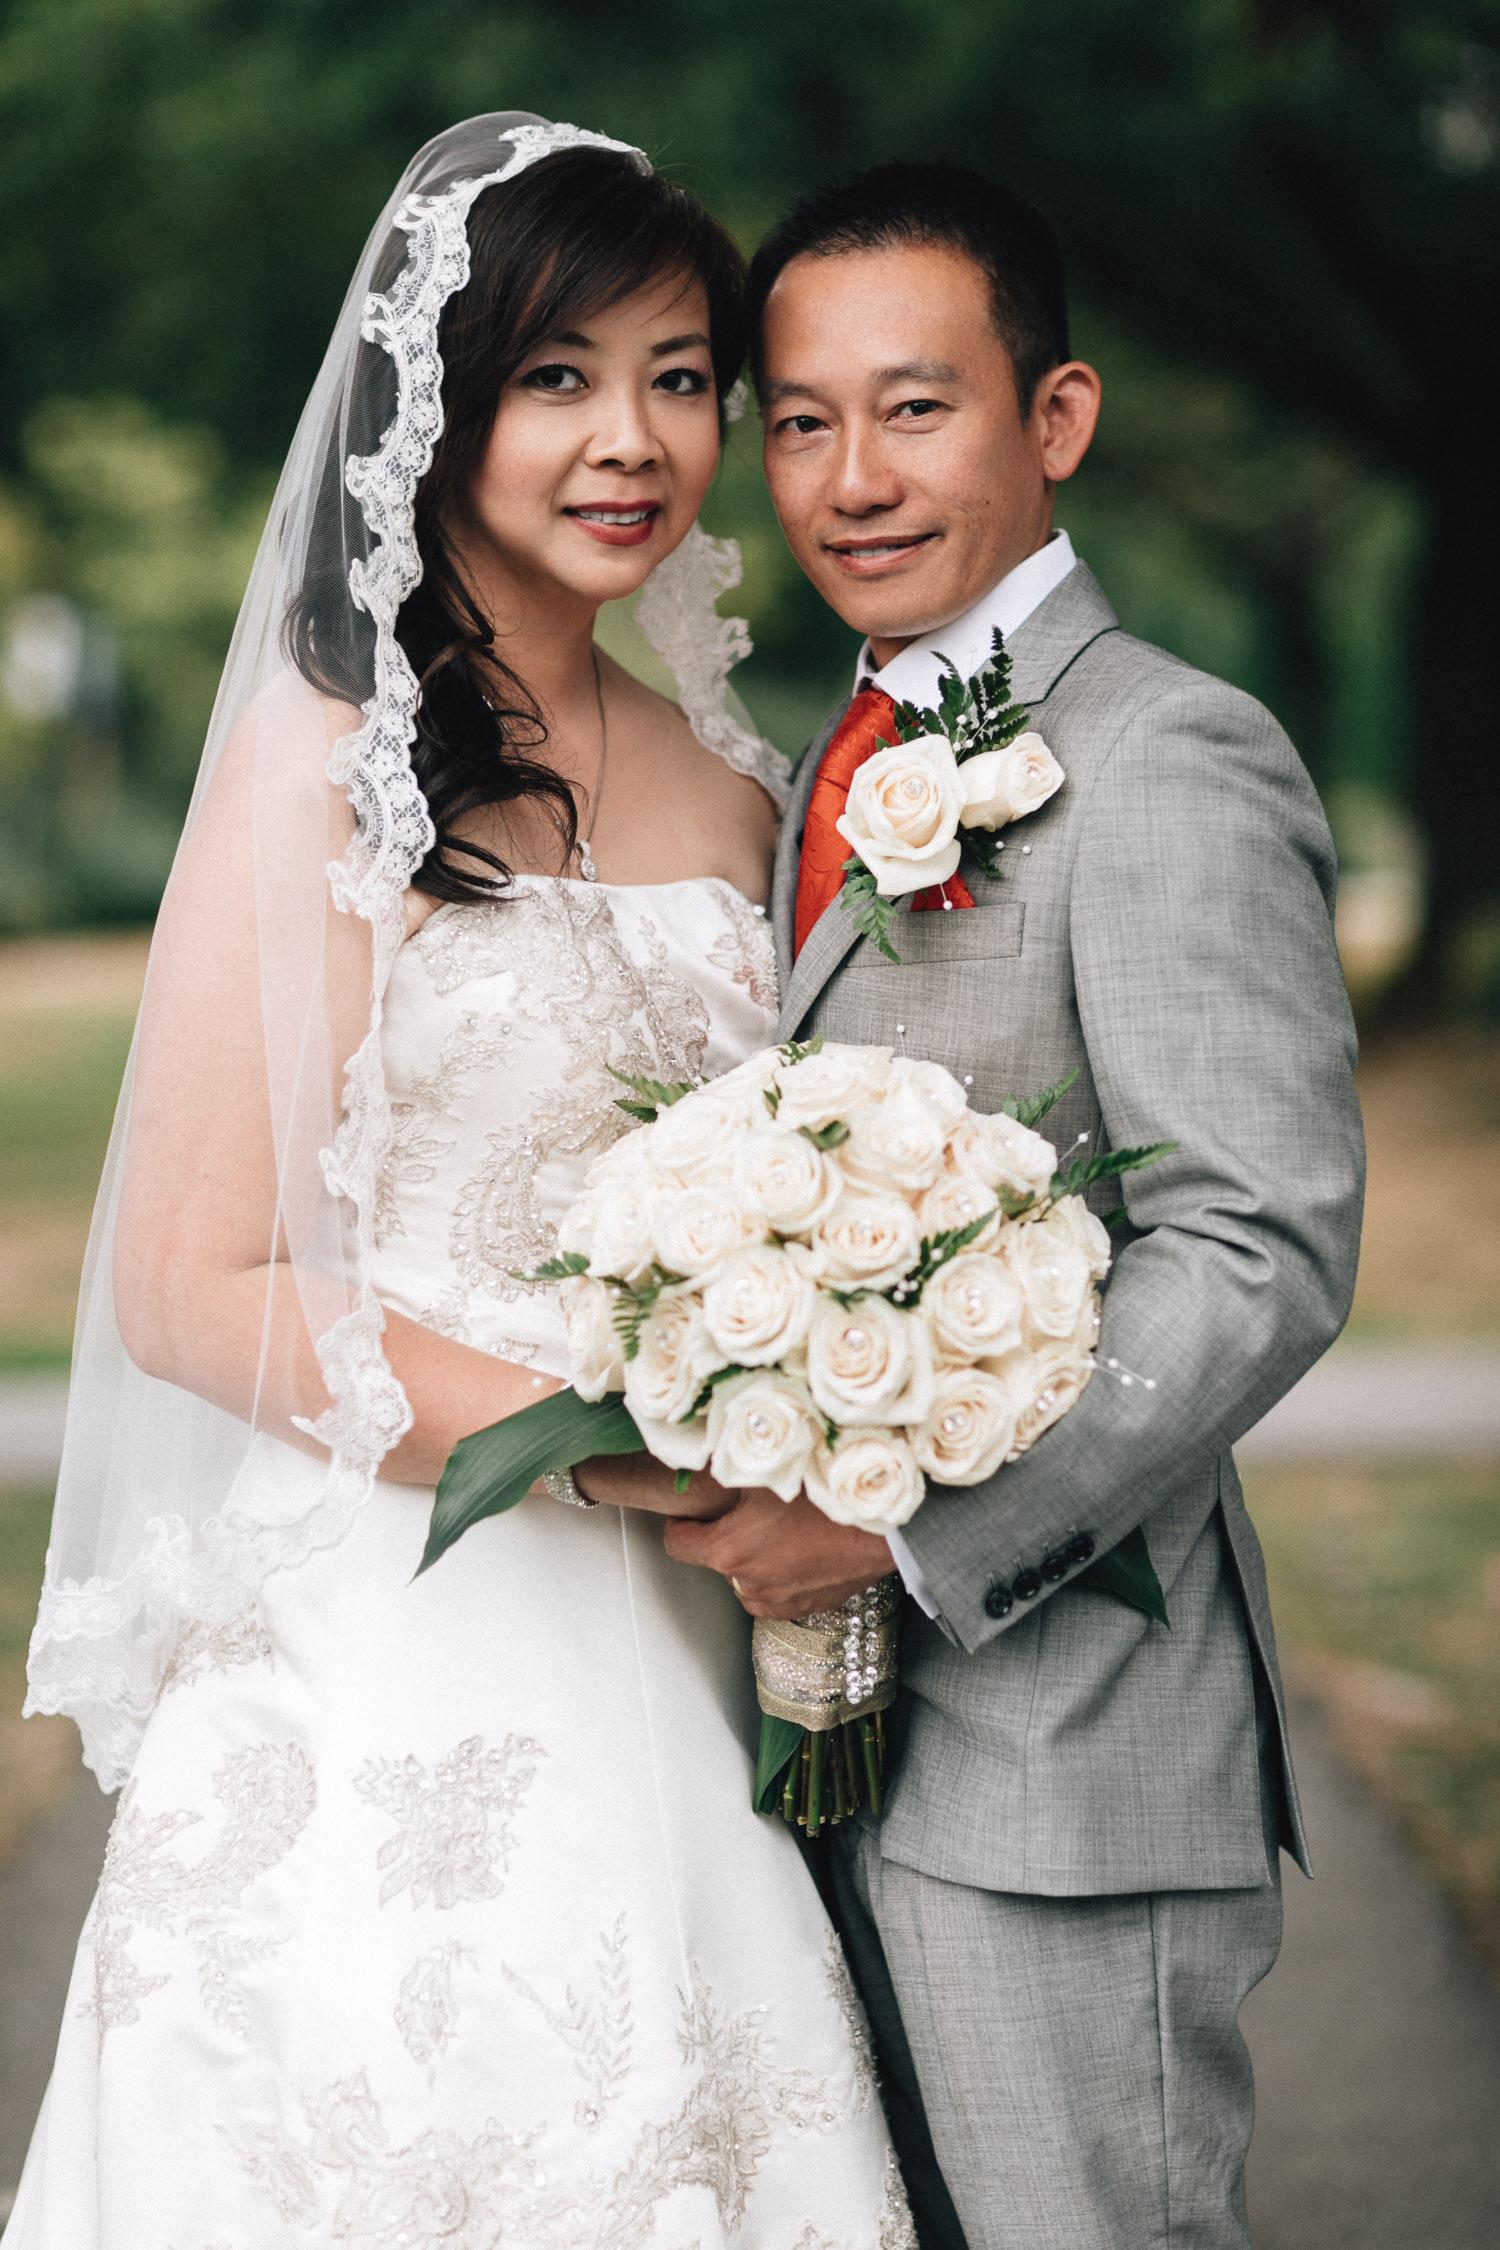 asian richmond wedding photography at minoru park chapel